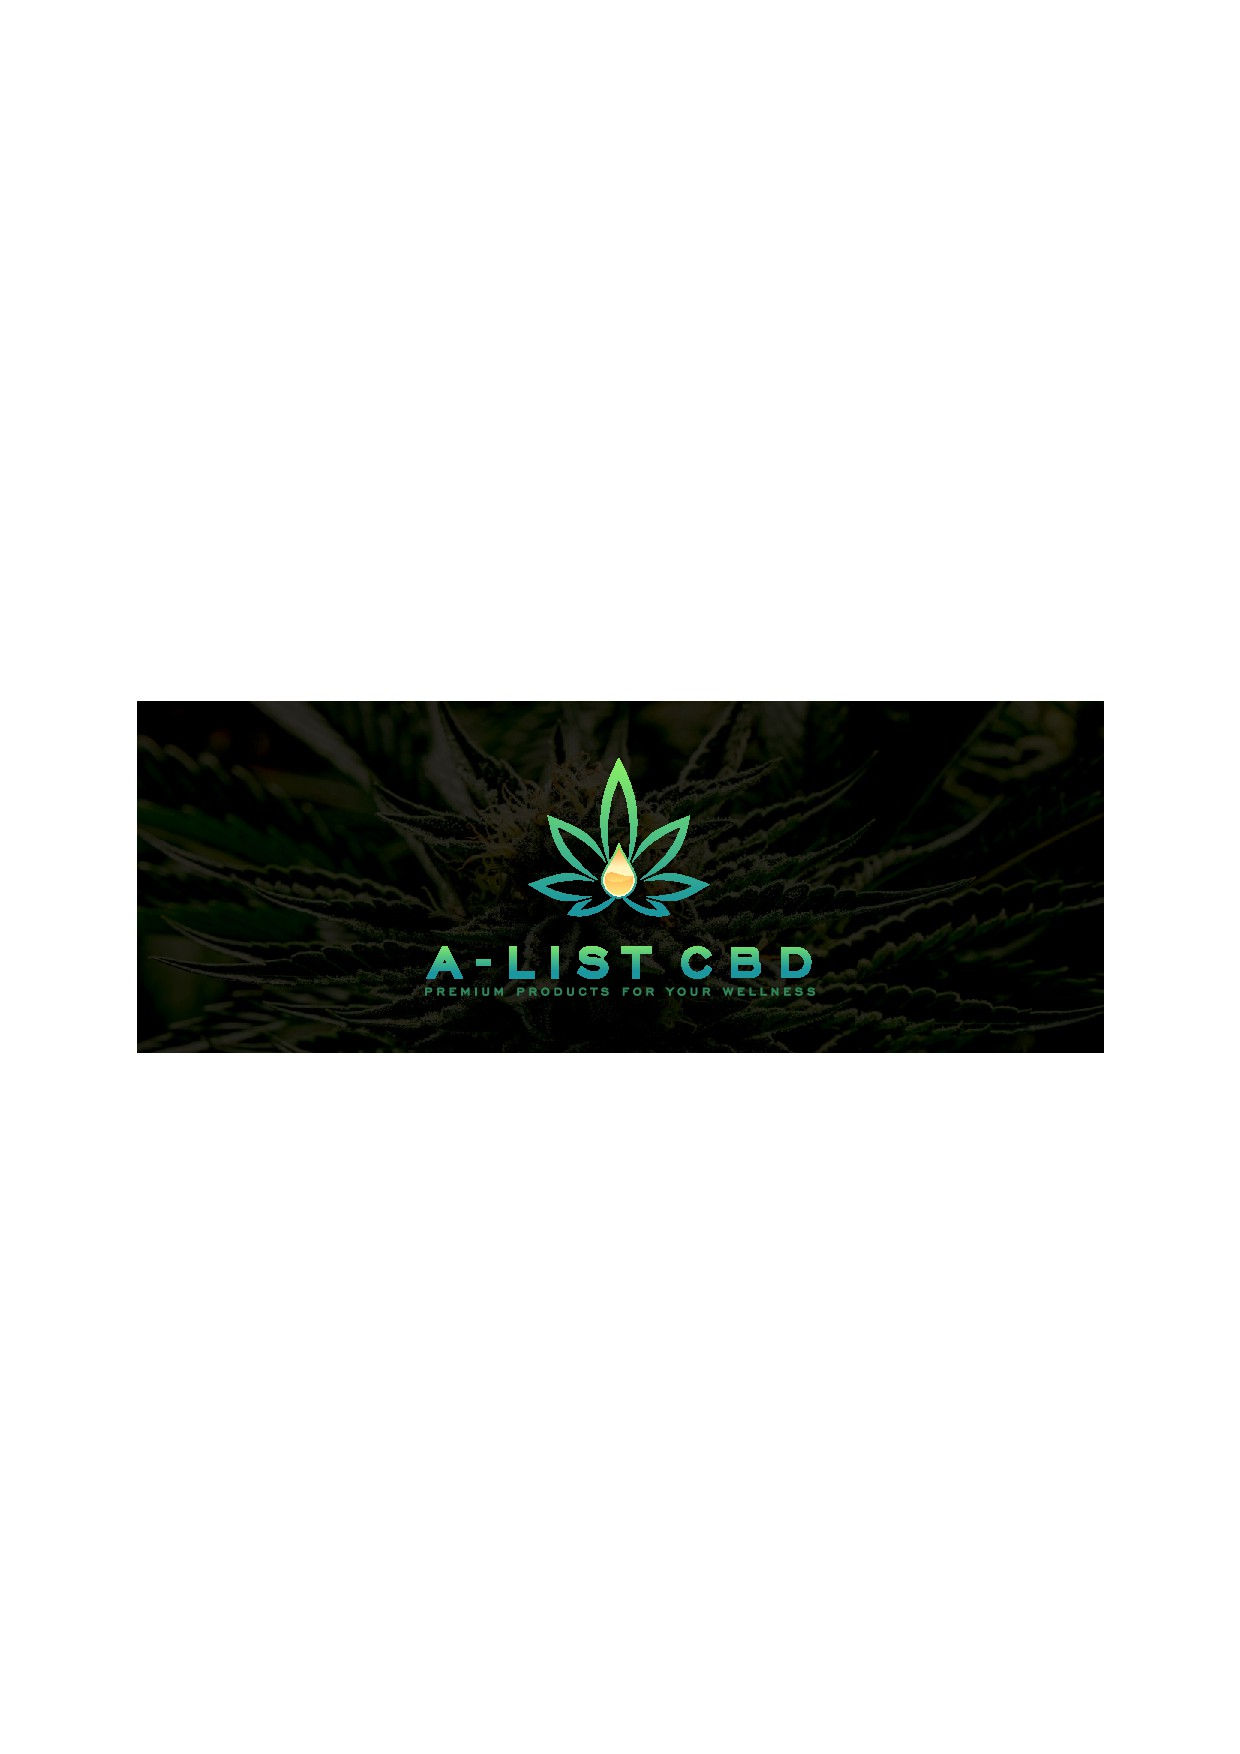 A-List CBD